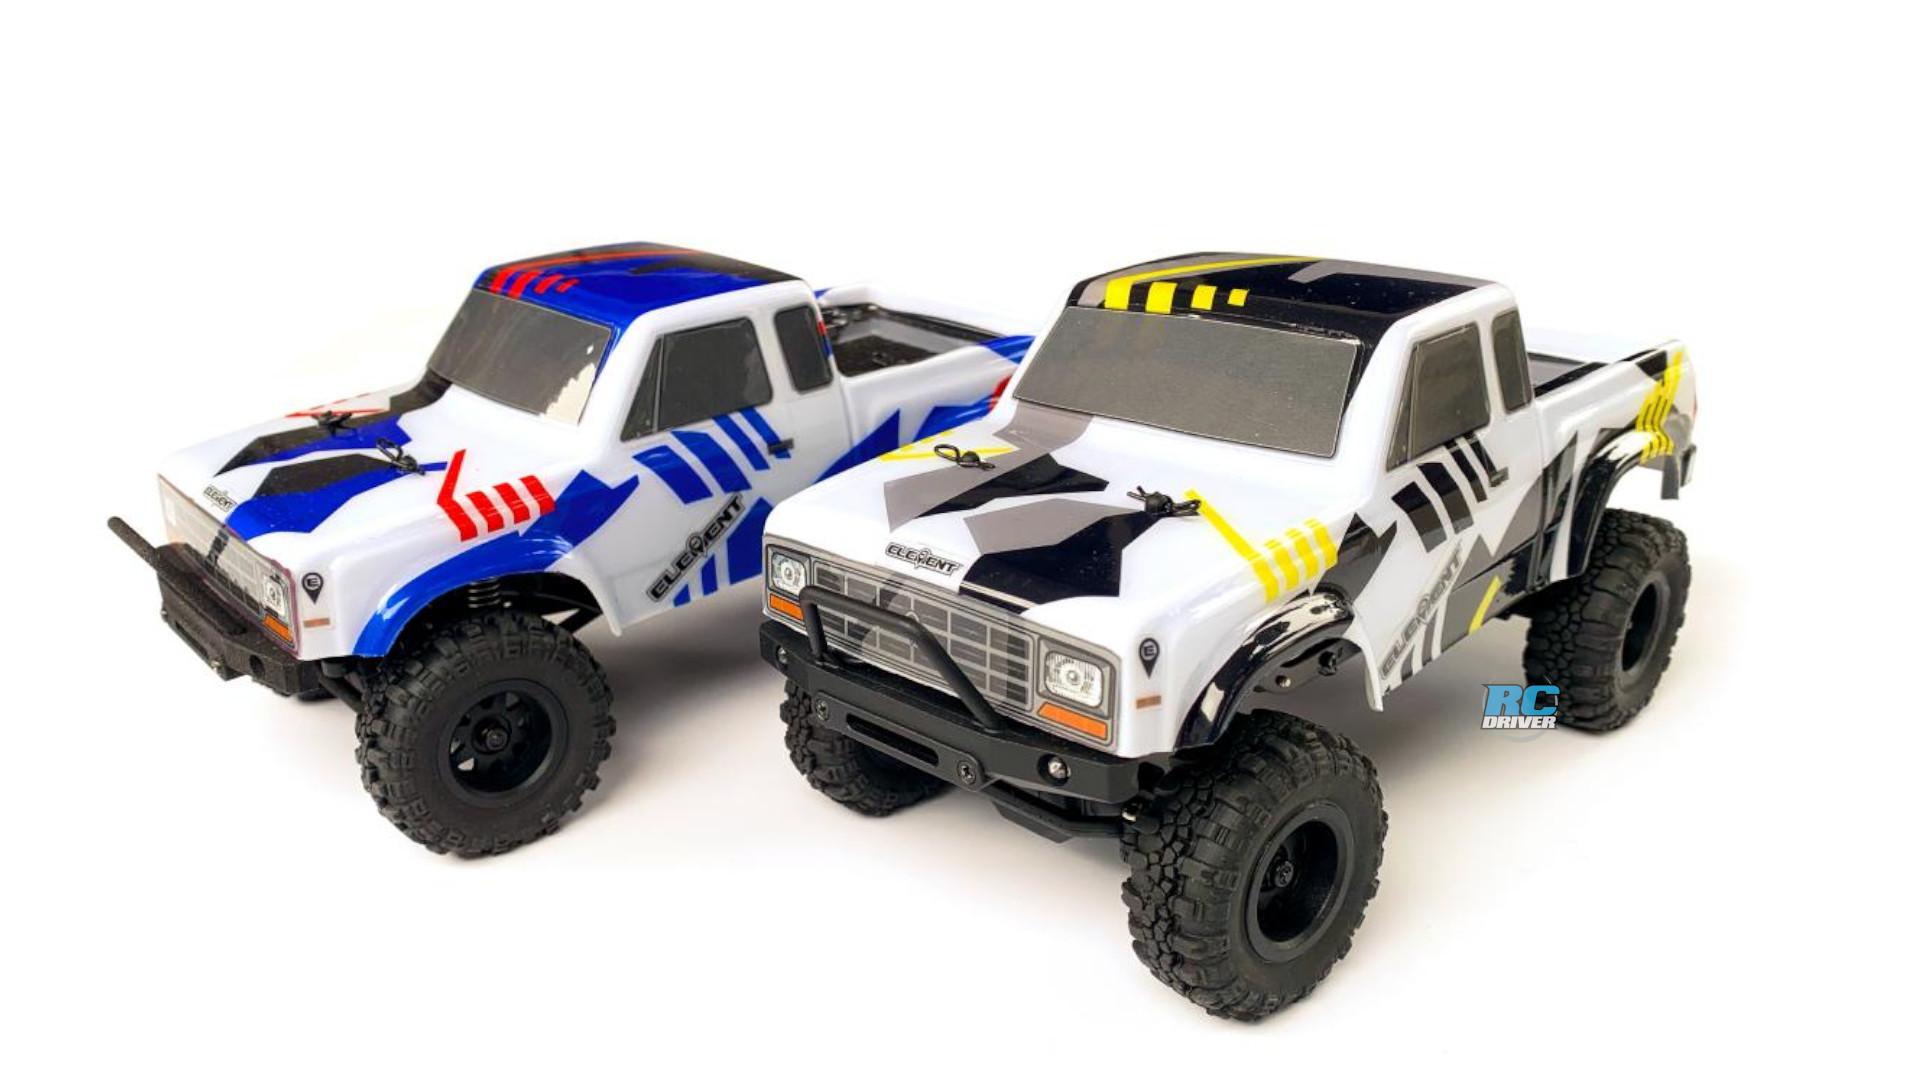 Element Enduro24 Crawler RTR, Sendero Trail Truck